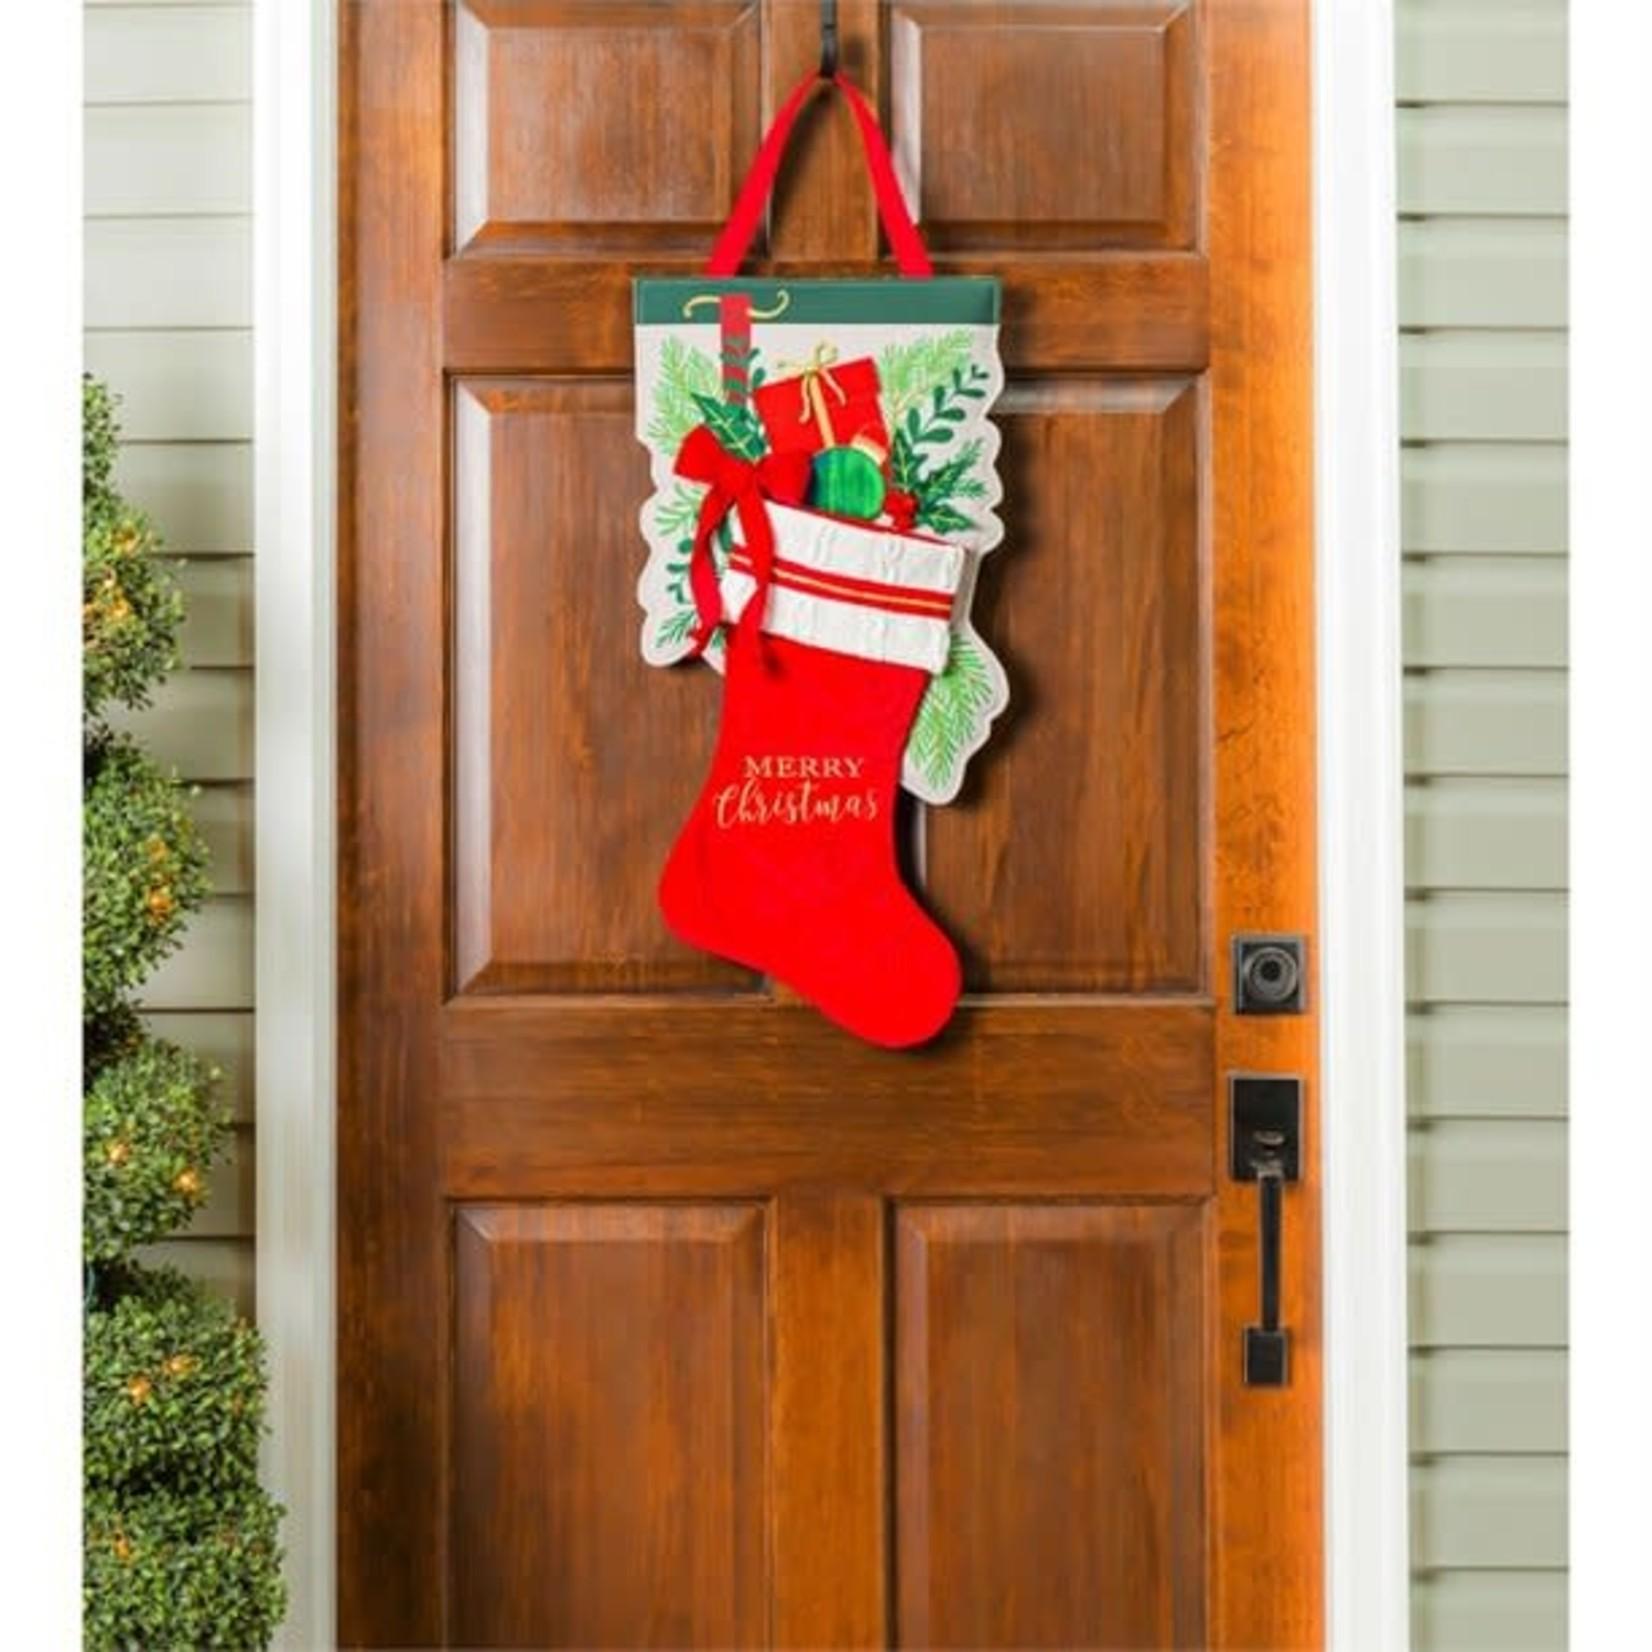 #DOOR DECOR MERRY CHRISTMAS STOCKING